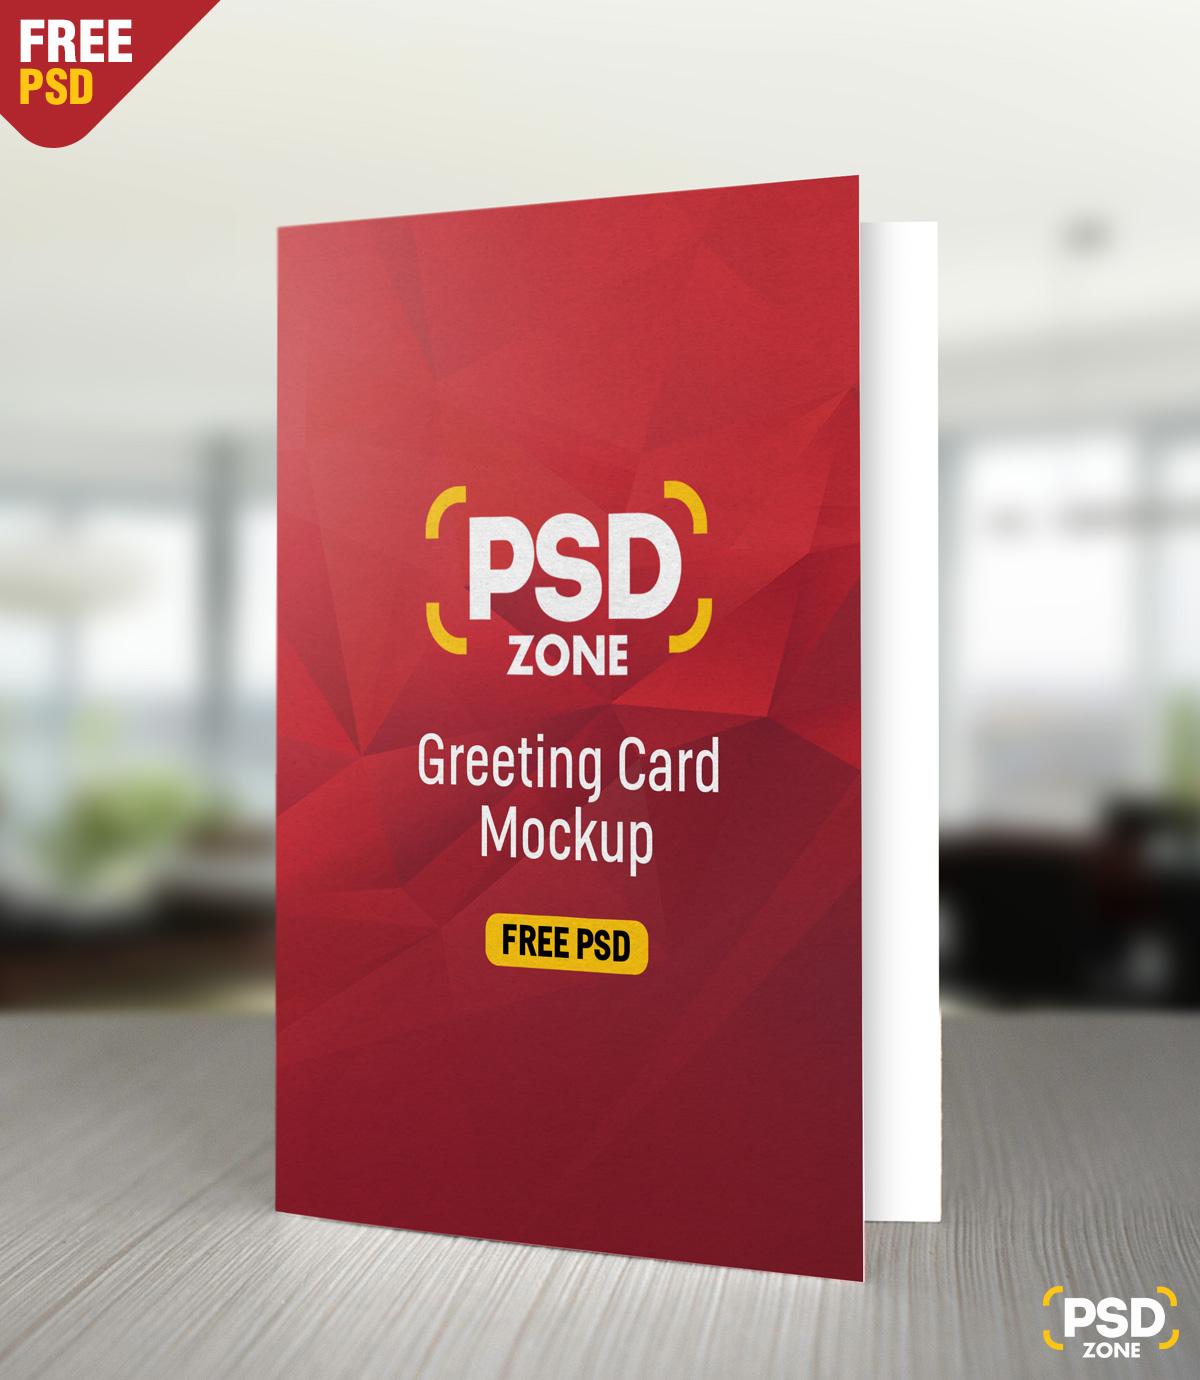 Greeting Card Mockup Free Psd Psd Zone